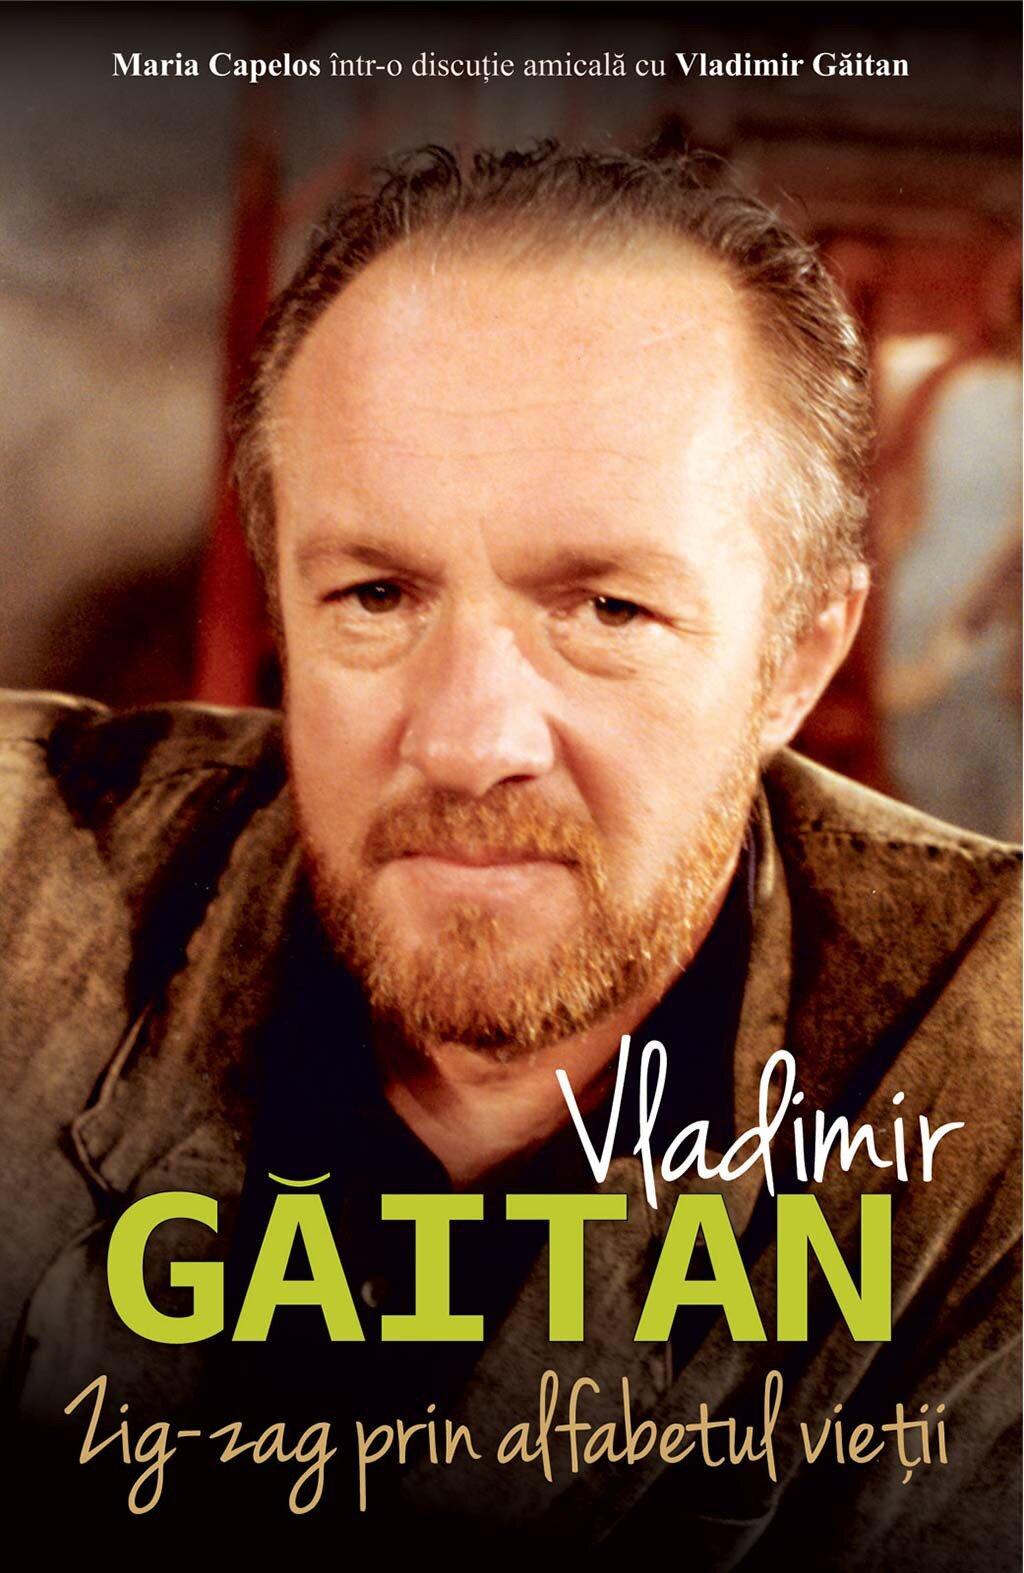 Zig-zag prin alfabetul vietii. Maria Capelos intr-o discutie cu Vladimir Gaitan (eBook)